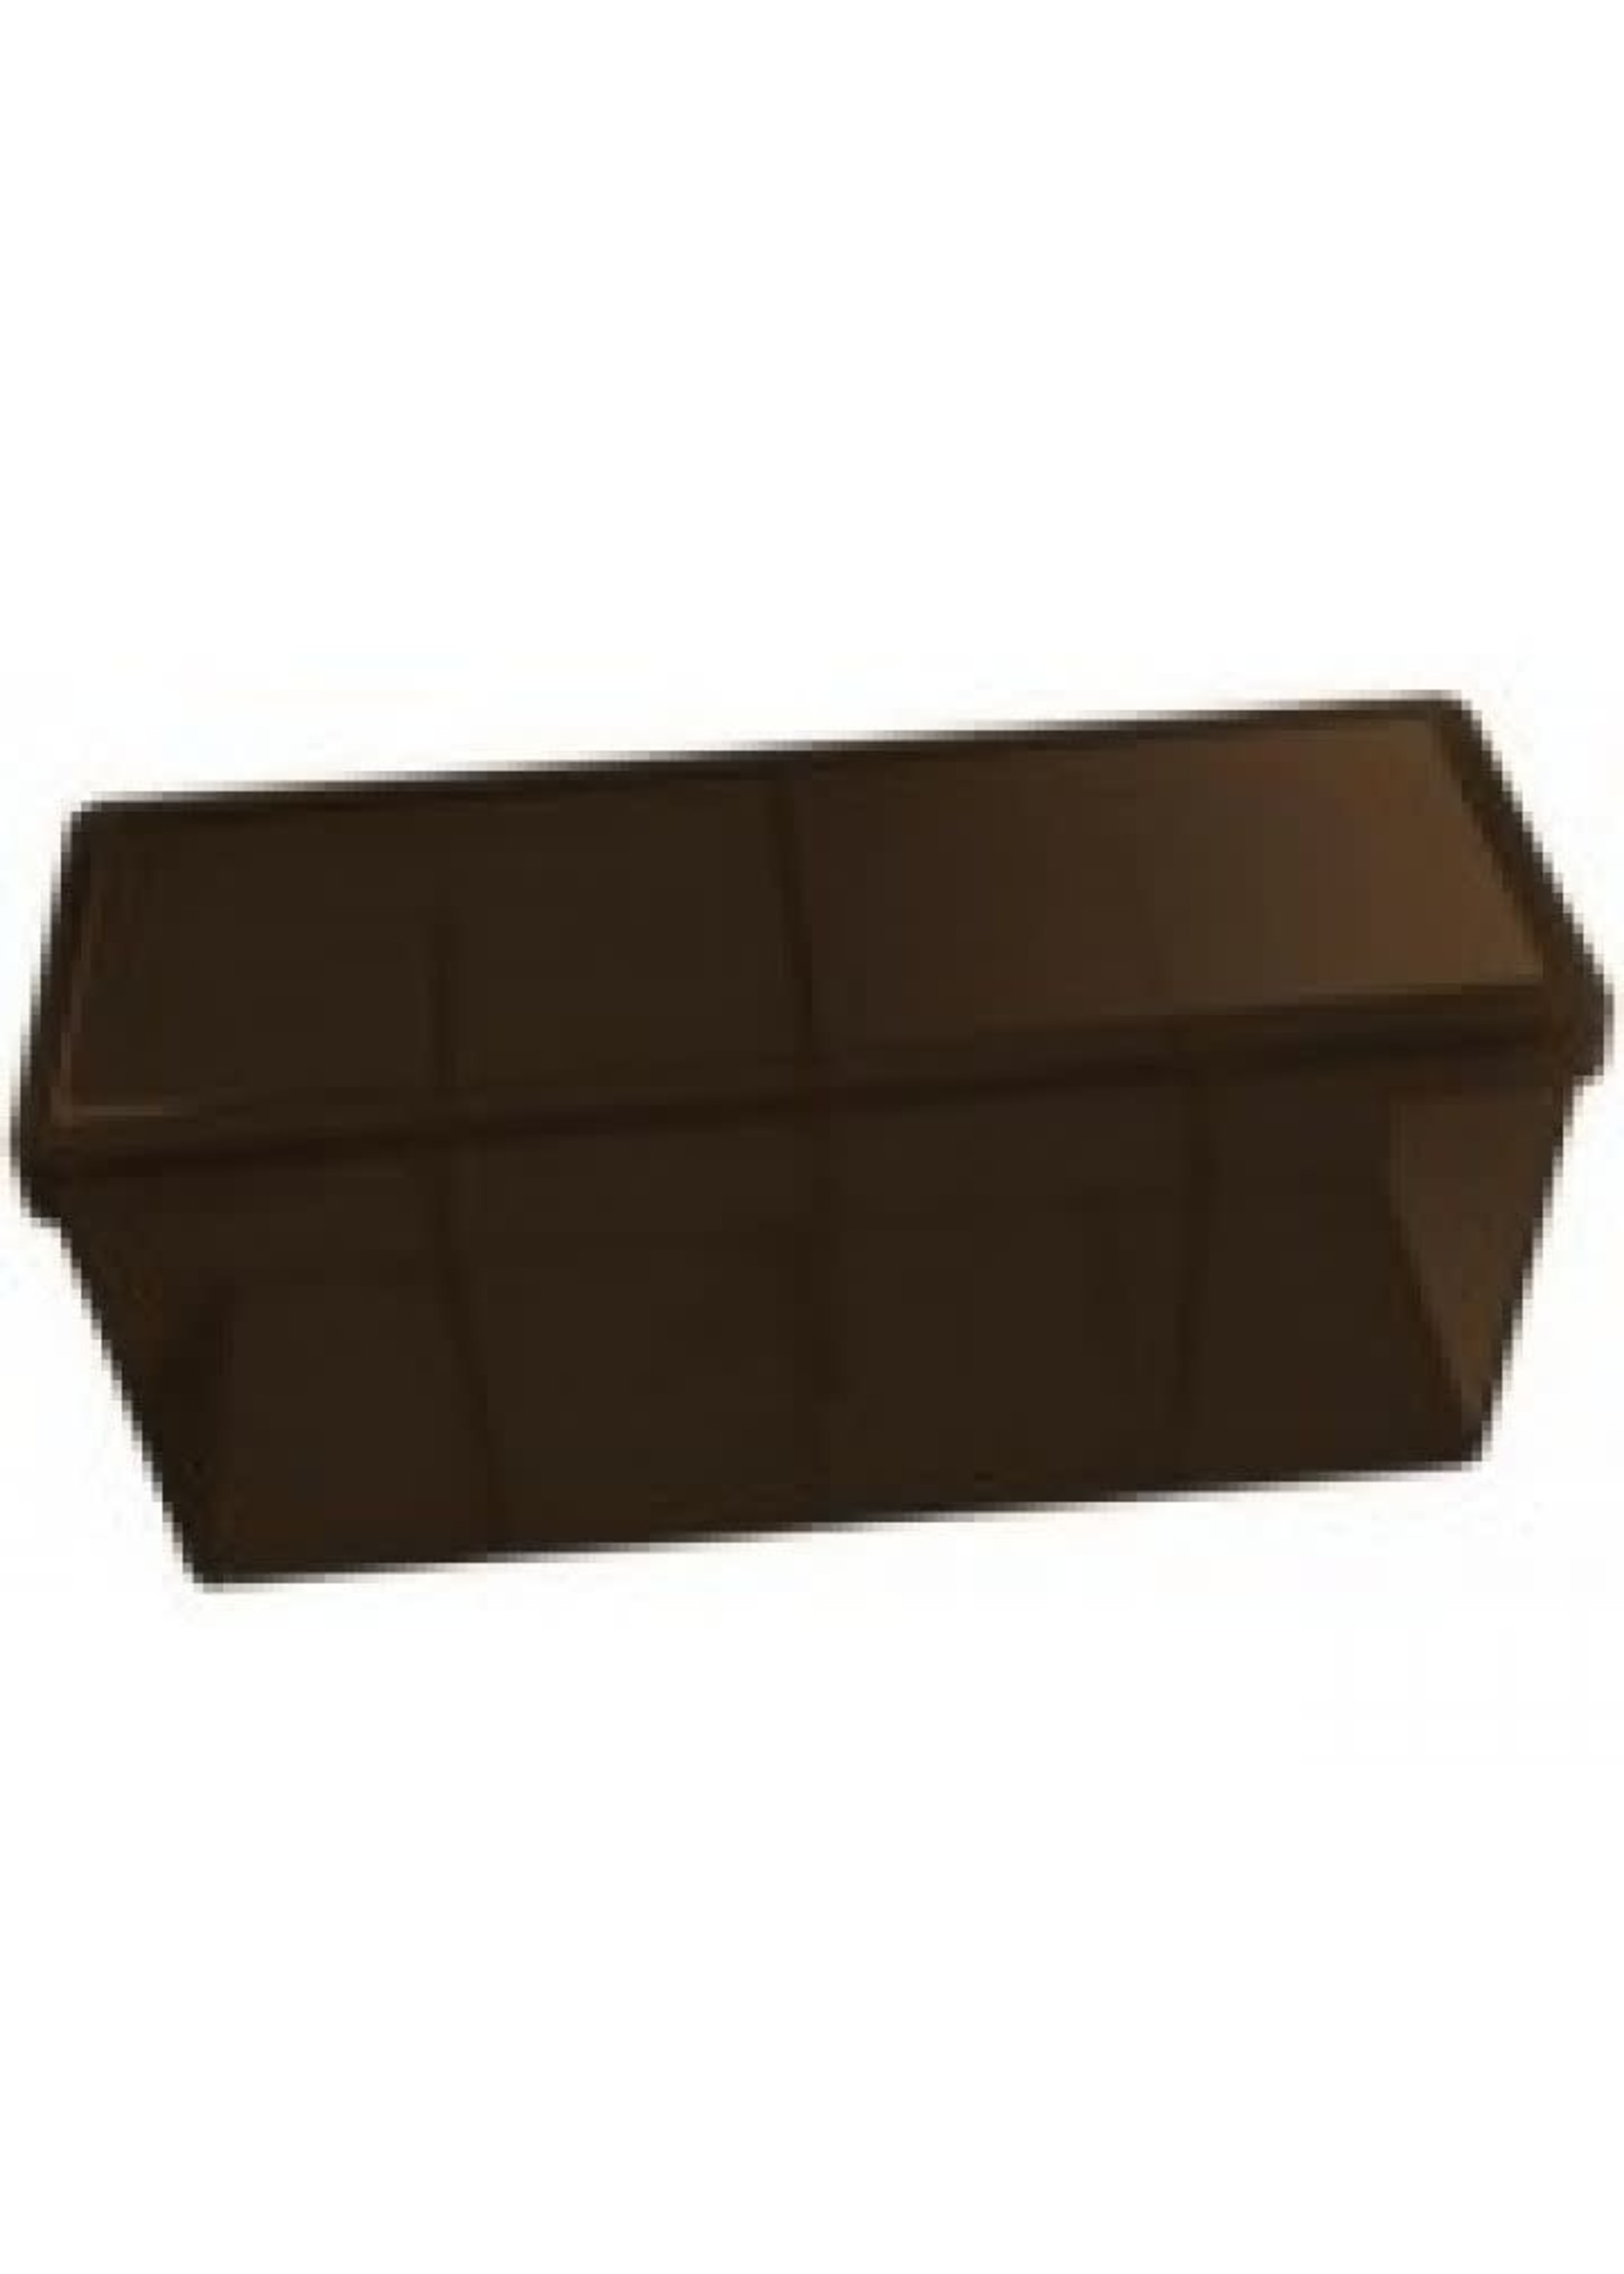 Dragonshield Four Compartment Storage Box Brown